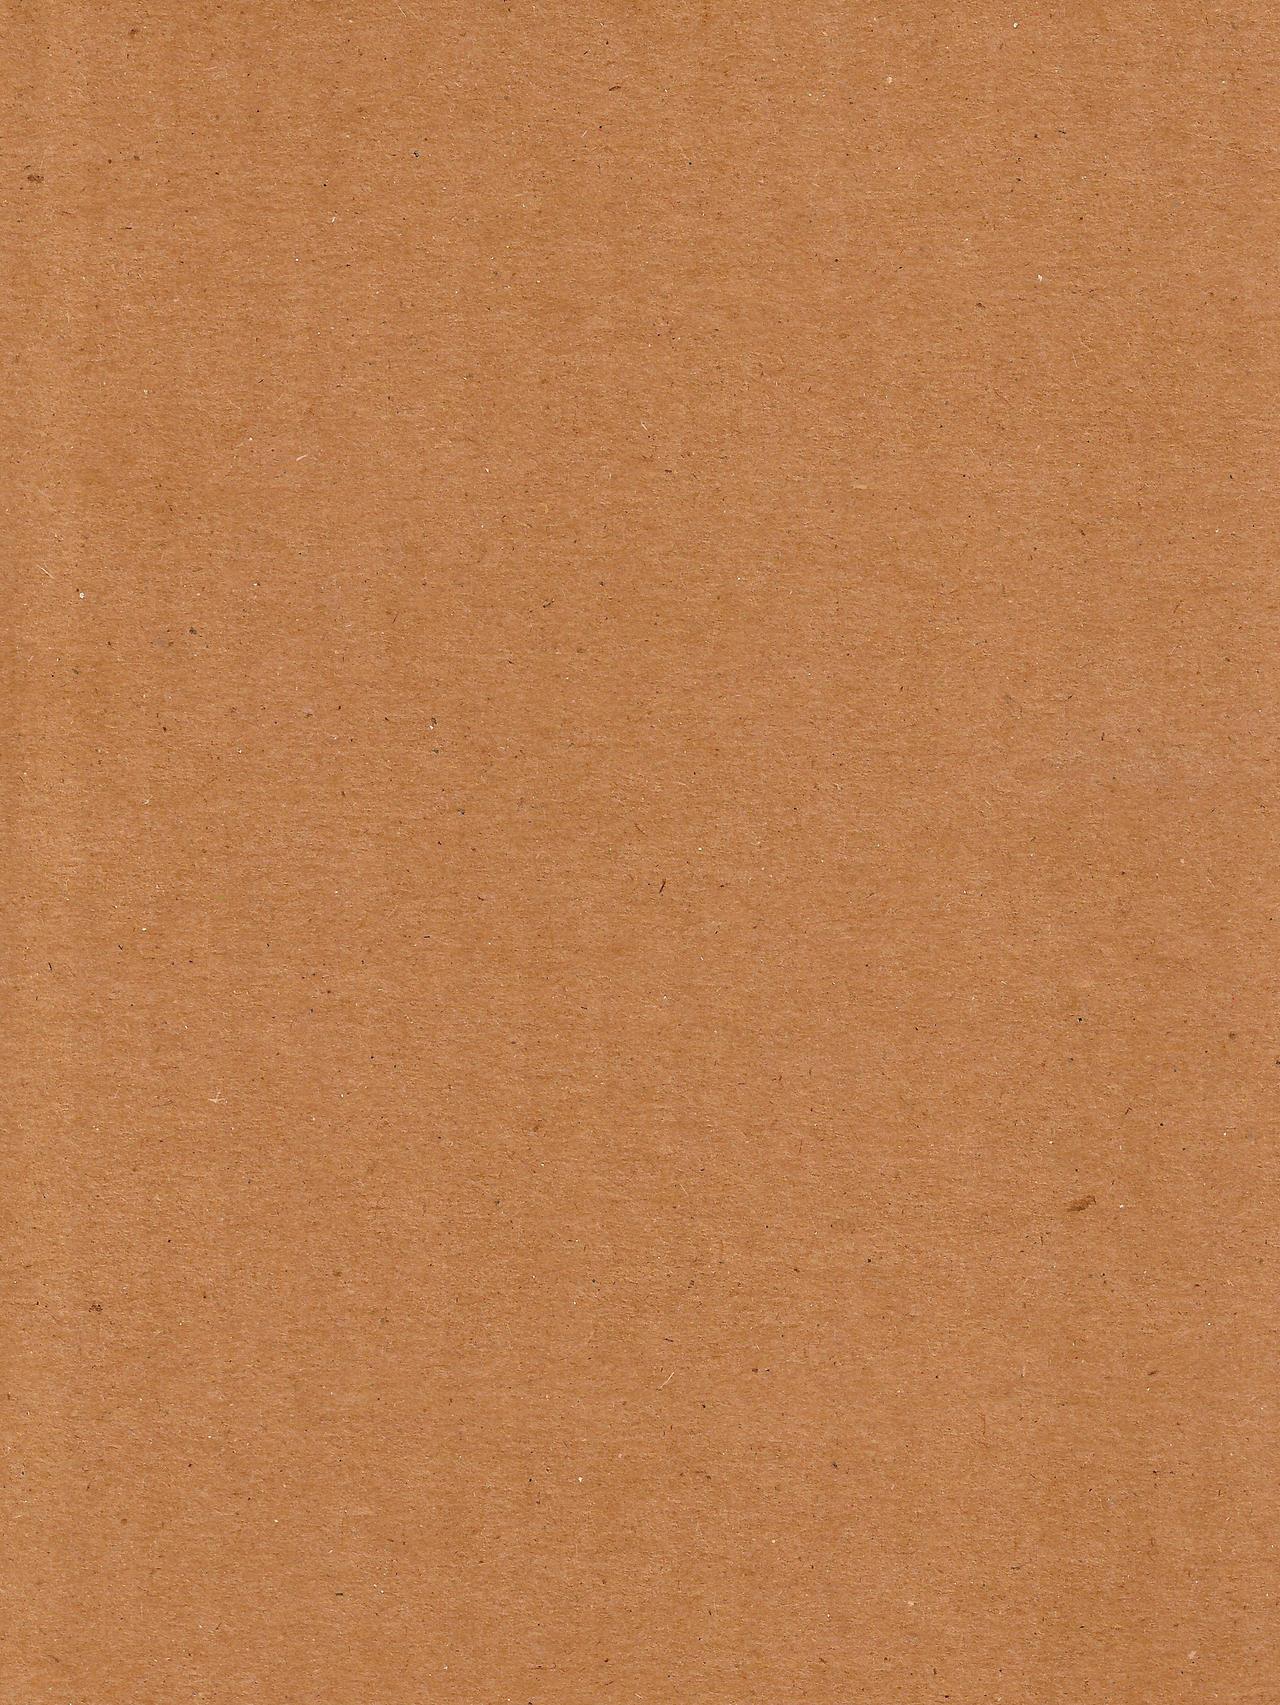 Cardboard Brown Paper Texture